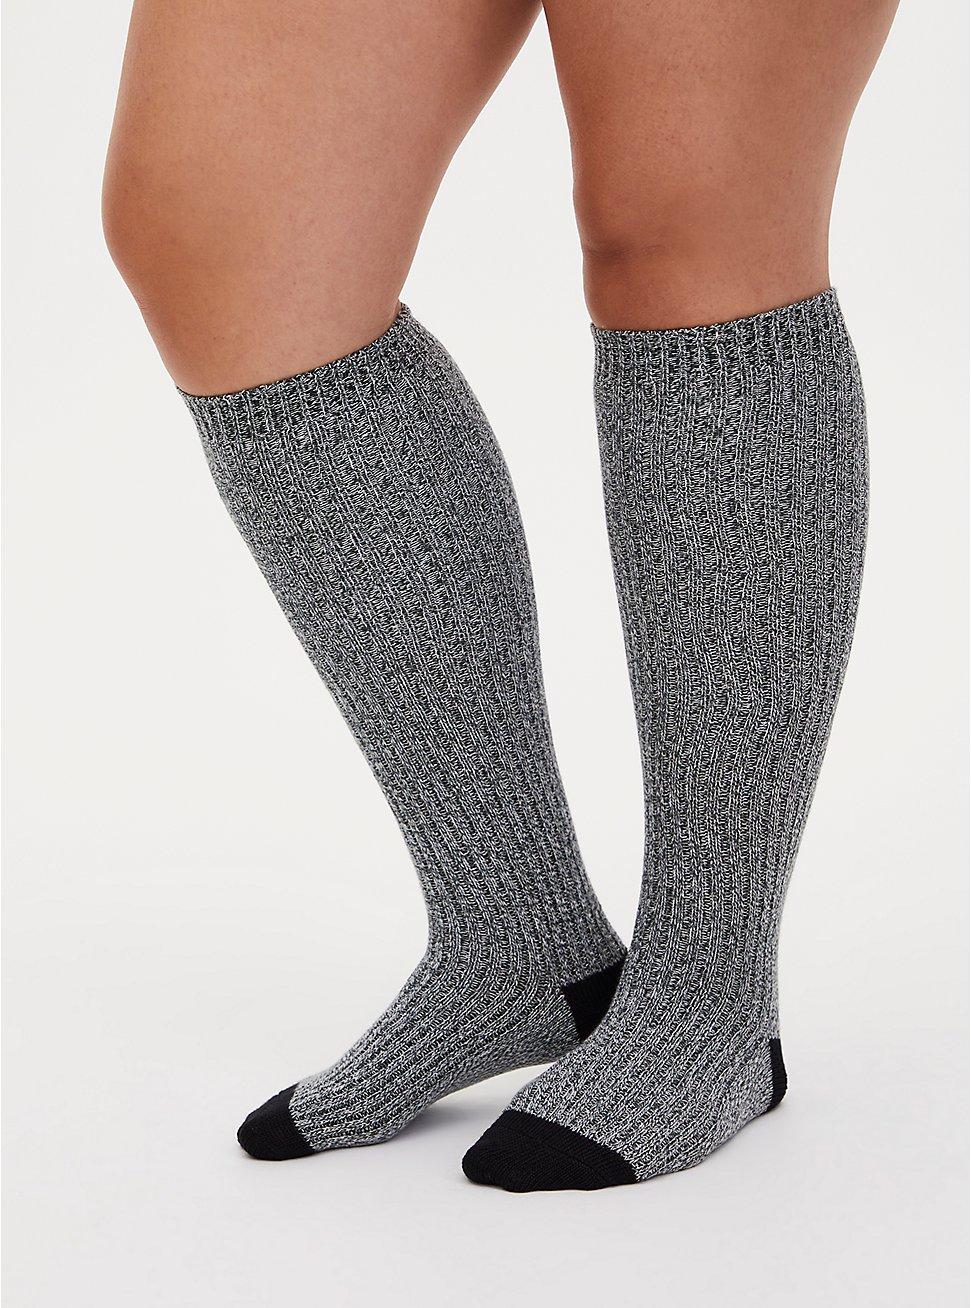 Olive Green Marled Cotton Knee-High Socks, MULTI, hi-res